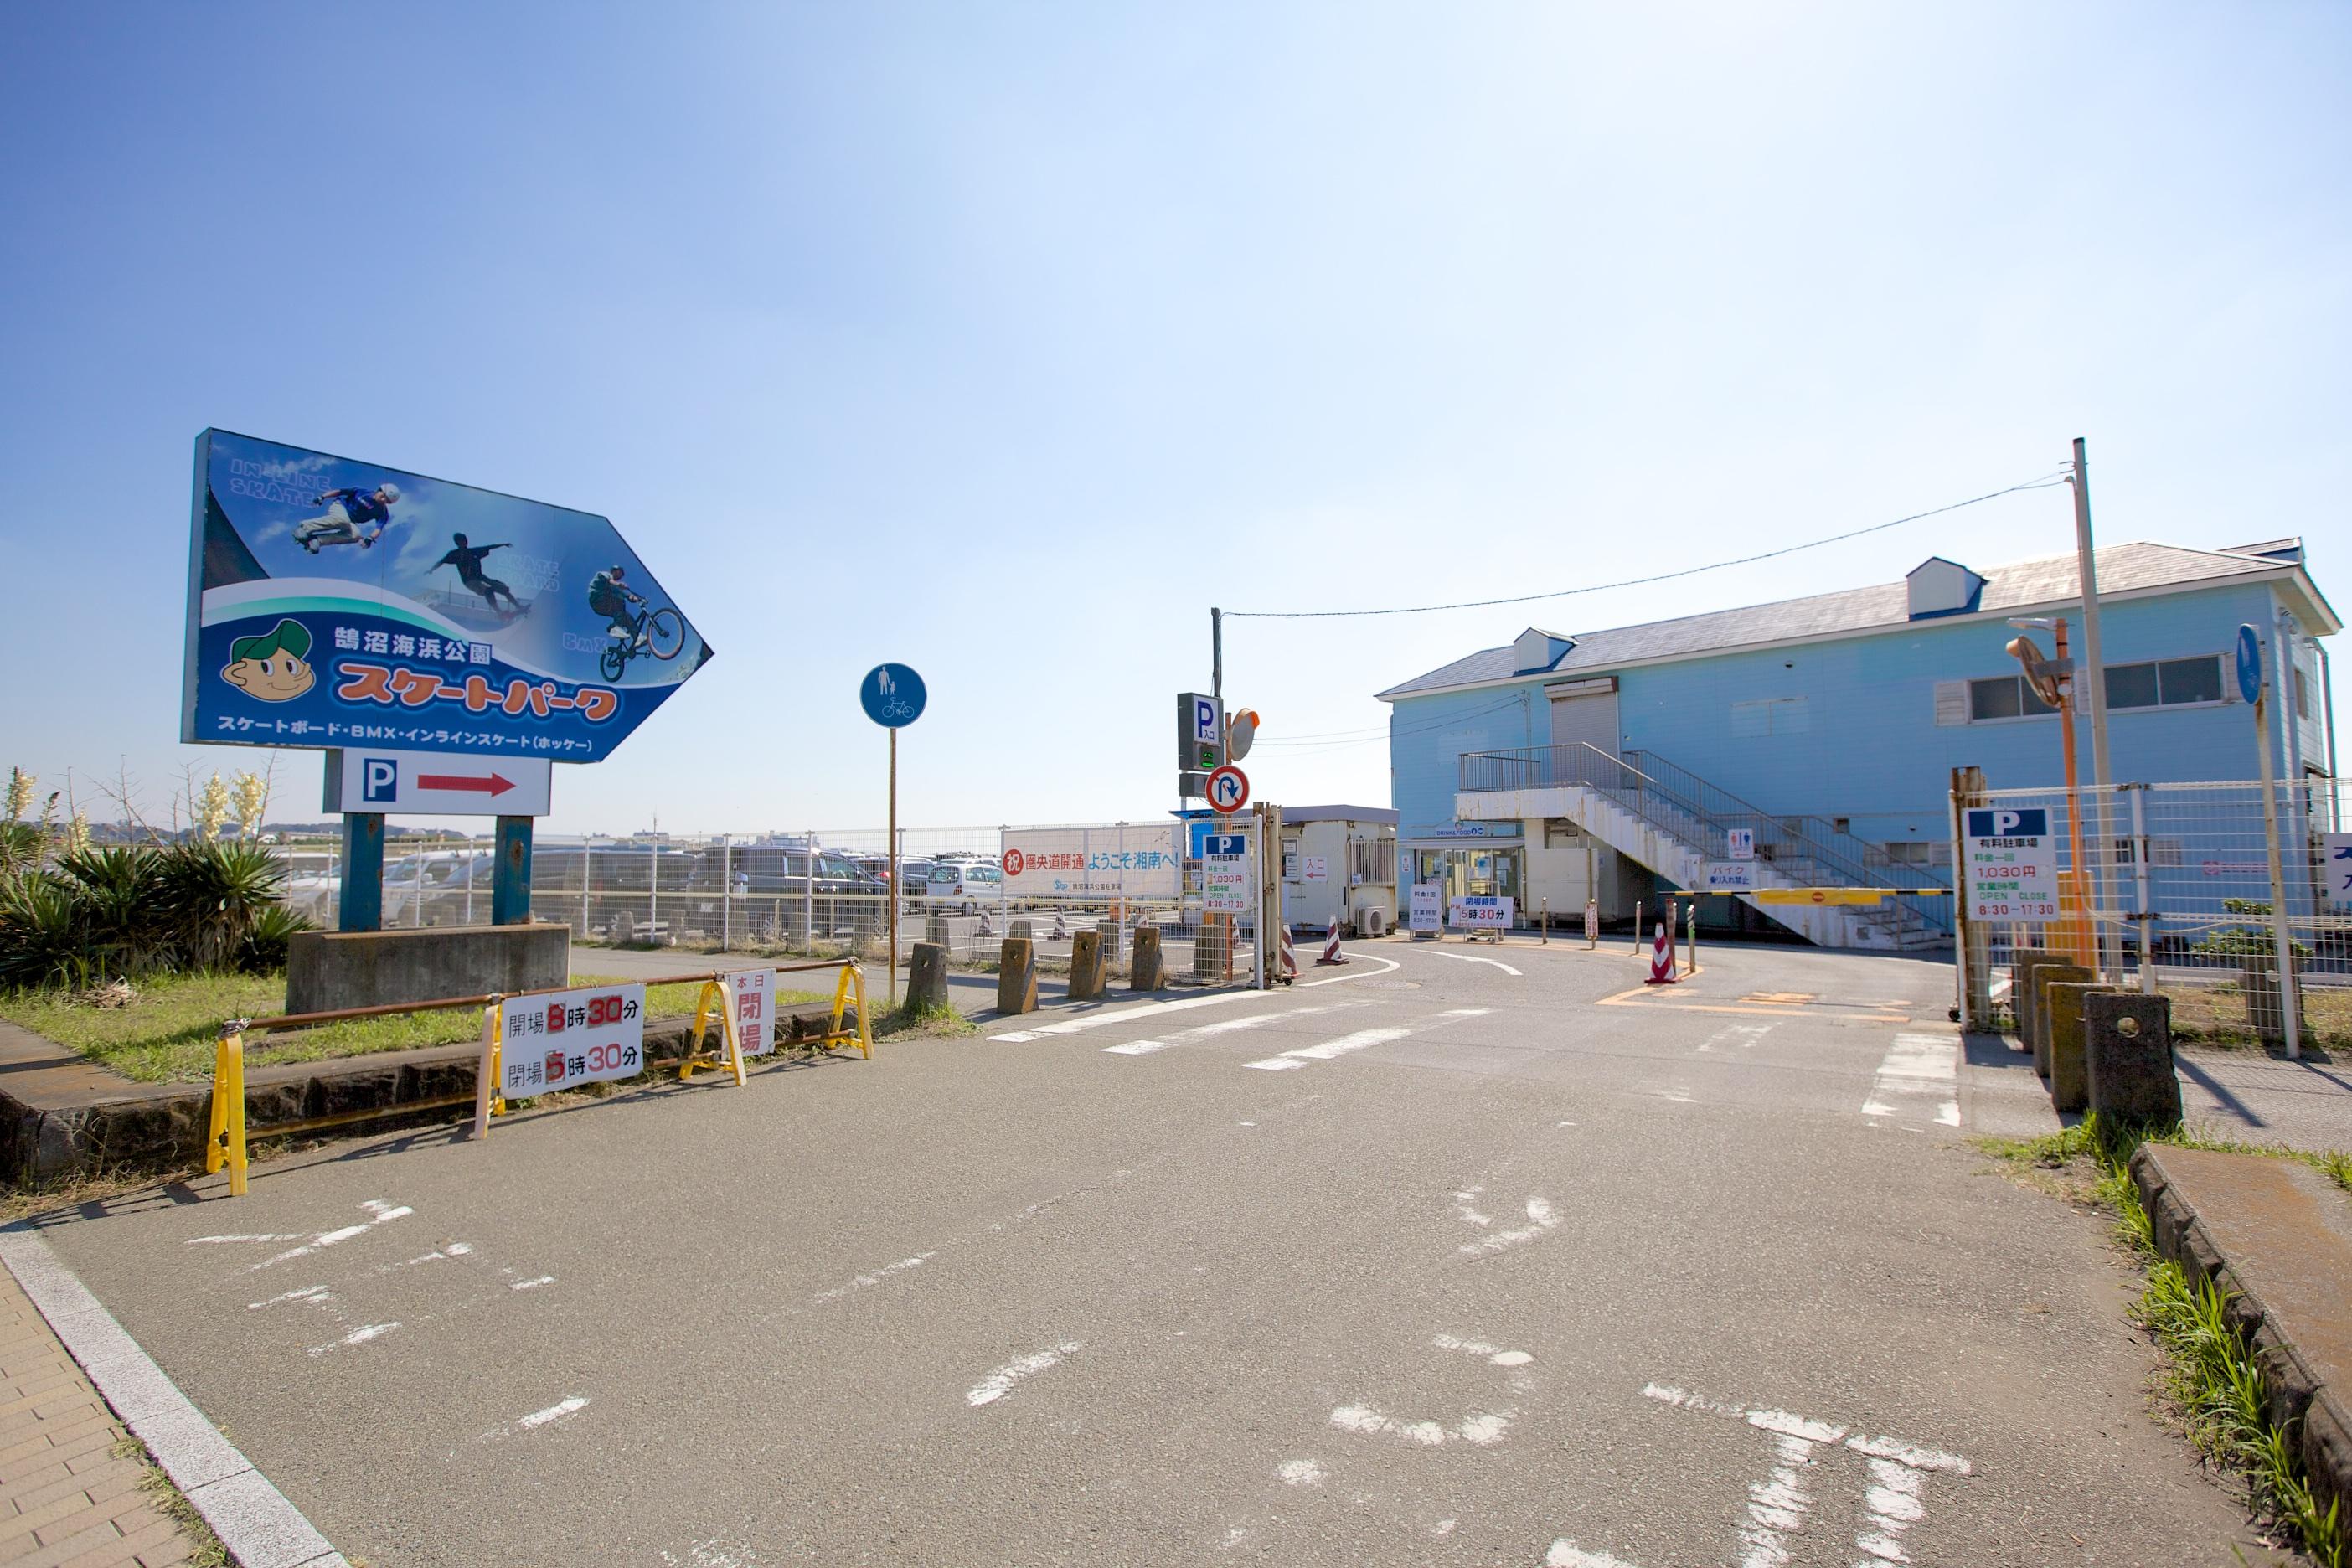 【P1】鵠沼海浜公園駐車場!混雑状況や料金は?